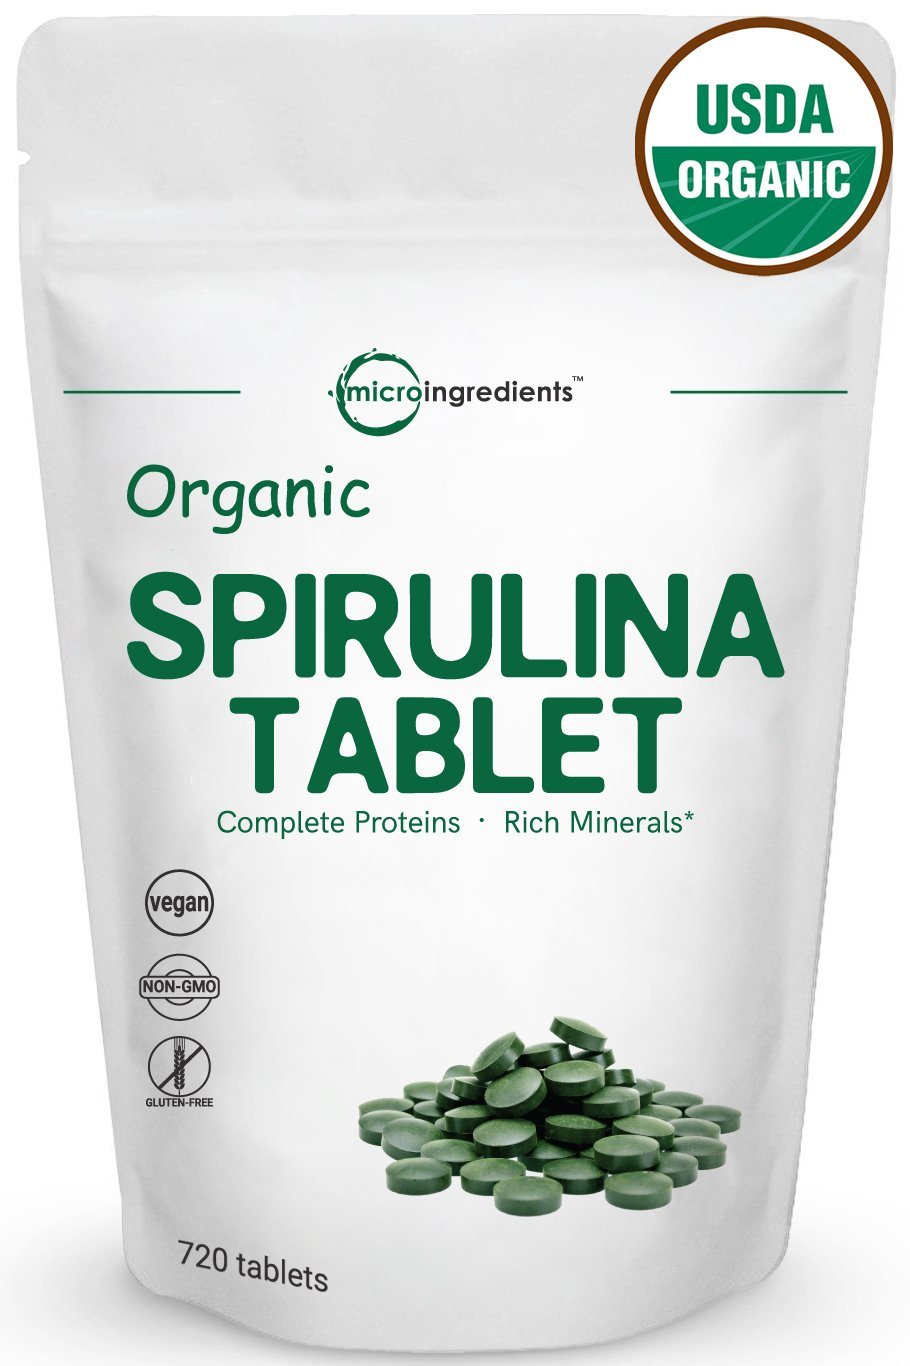 Organic Spirulina Supplements, 3000mg Per Serving, 720 Tablets, Best Superfoods for Rich Minerals, Vitamins, Chlorophyll, Amino Acids, Fatty Acids, Fiber & Proteins, Non-GMO & Vegan Friendly